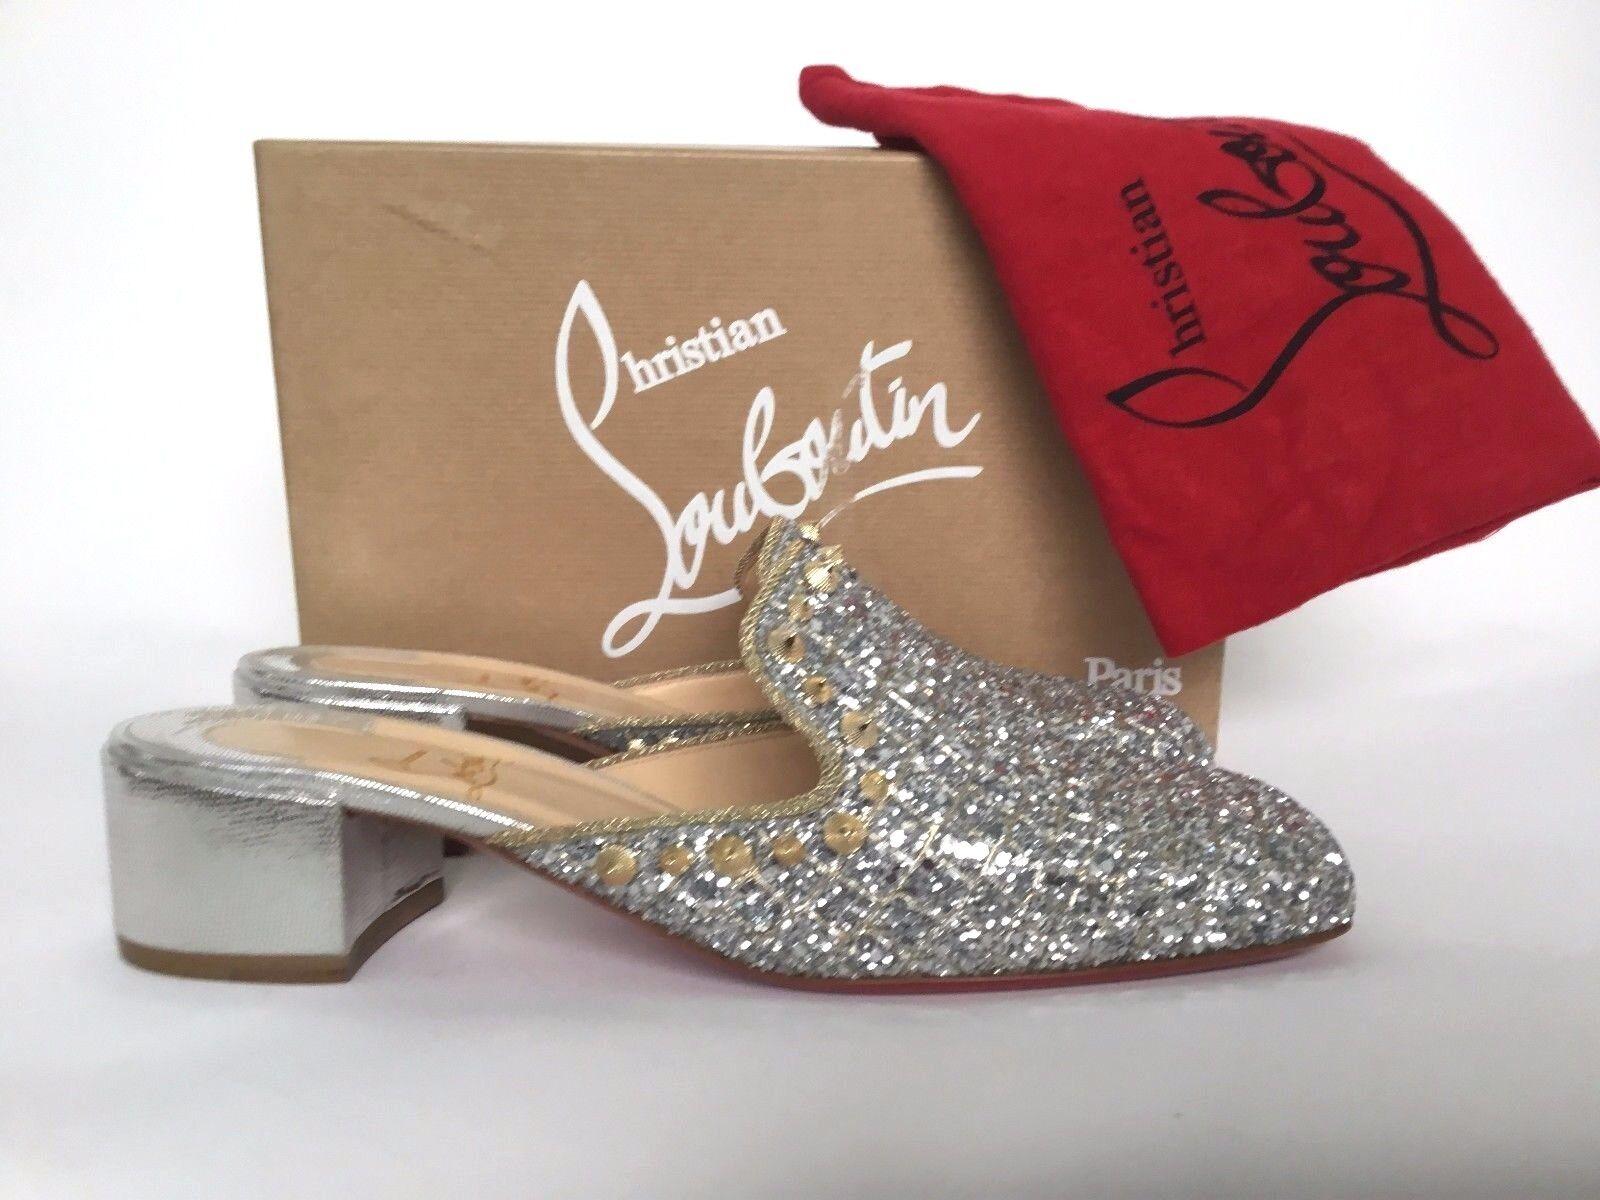 Christian Louboutin Spiky Sun 35 Silber Glitter Mule Loafer 41  11